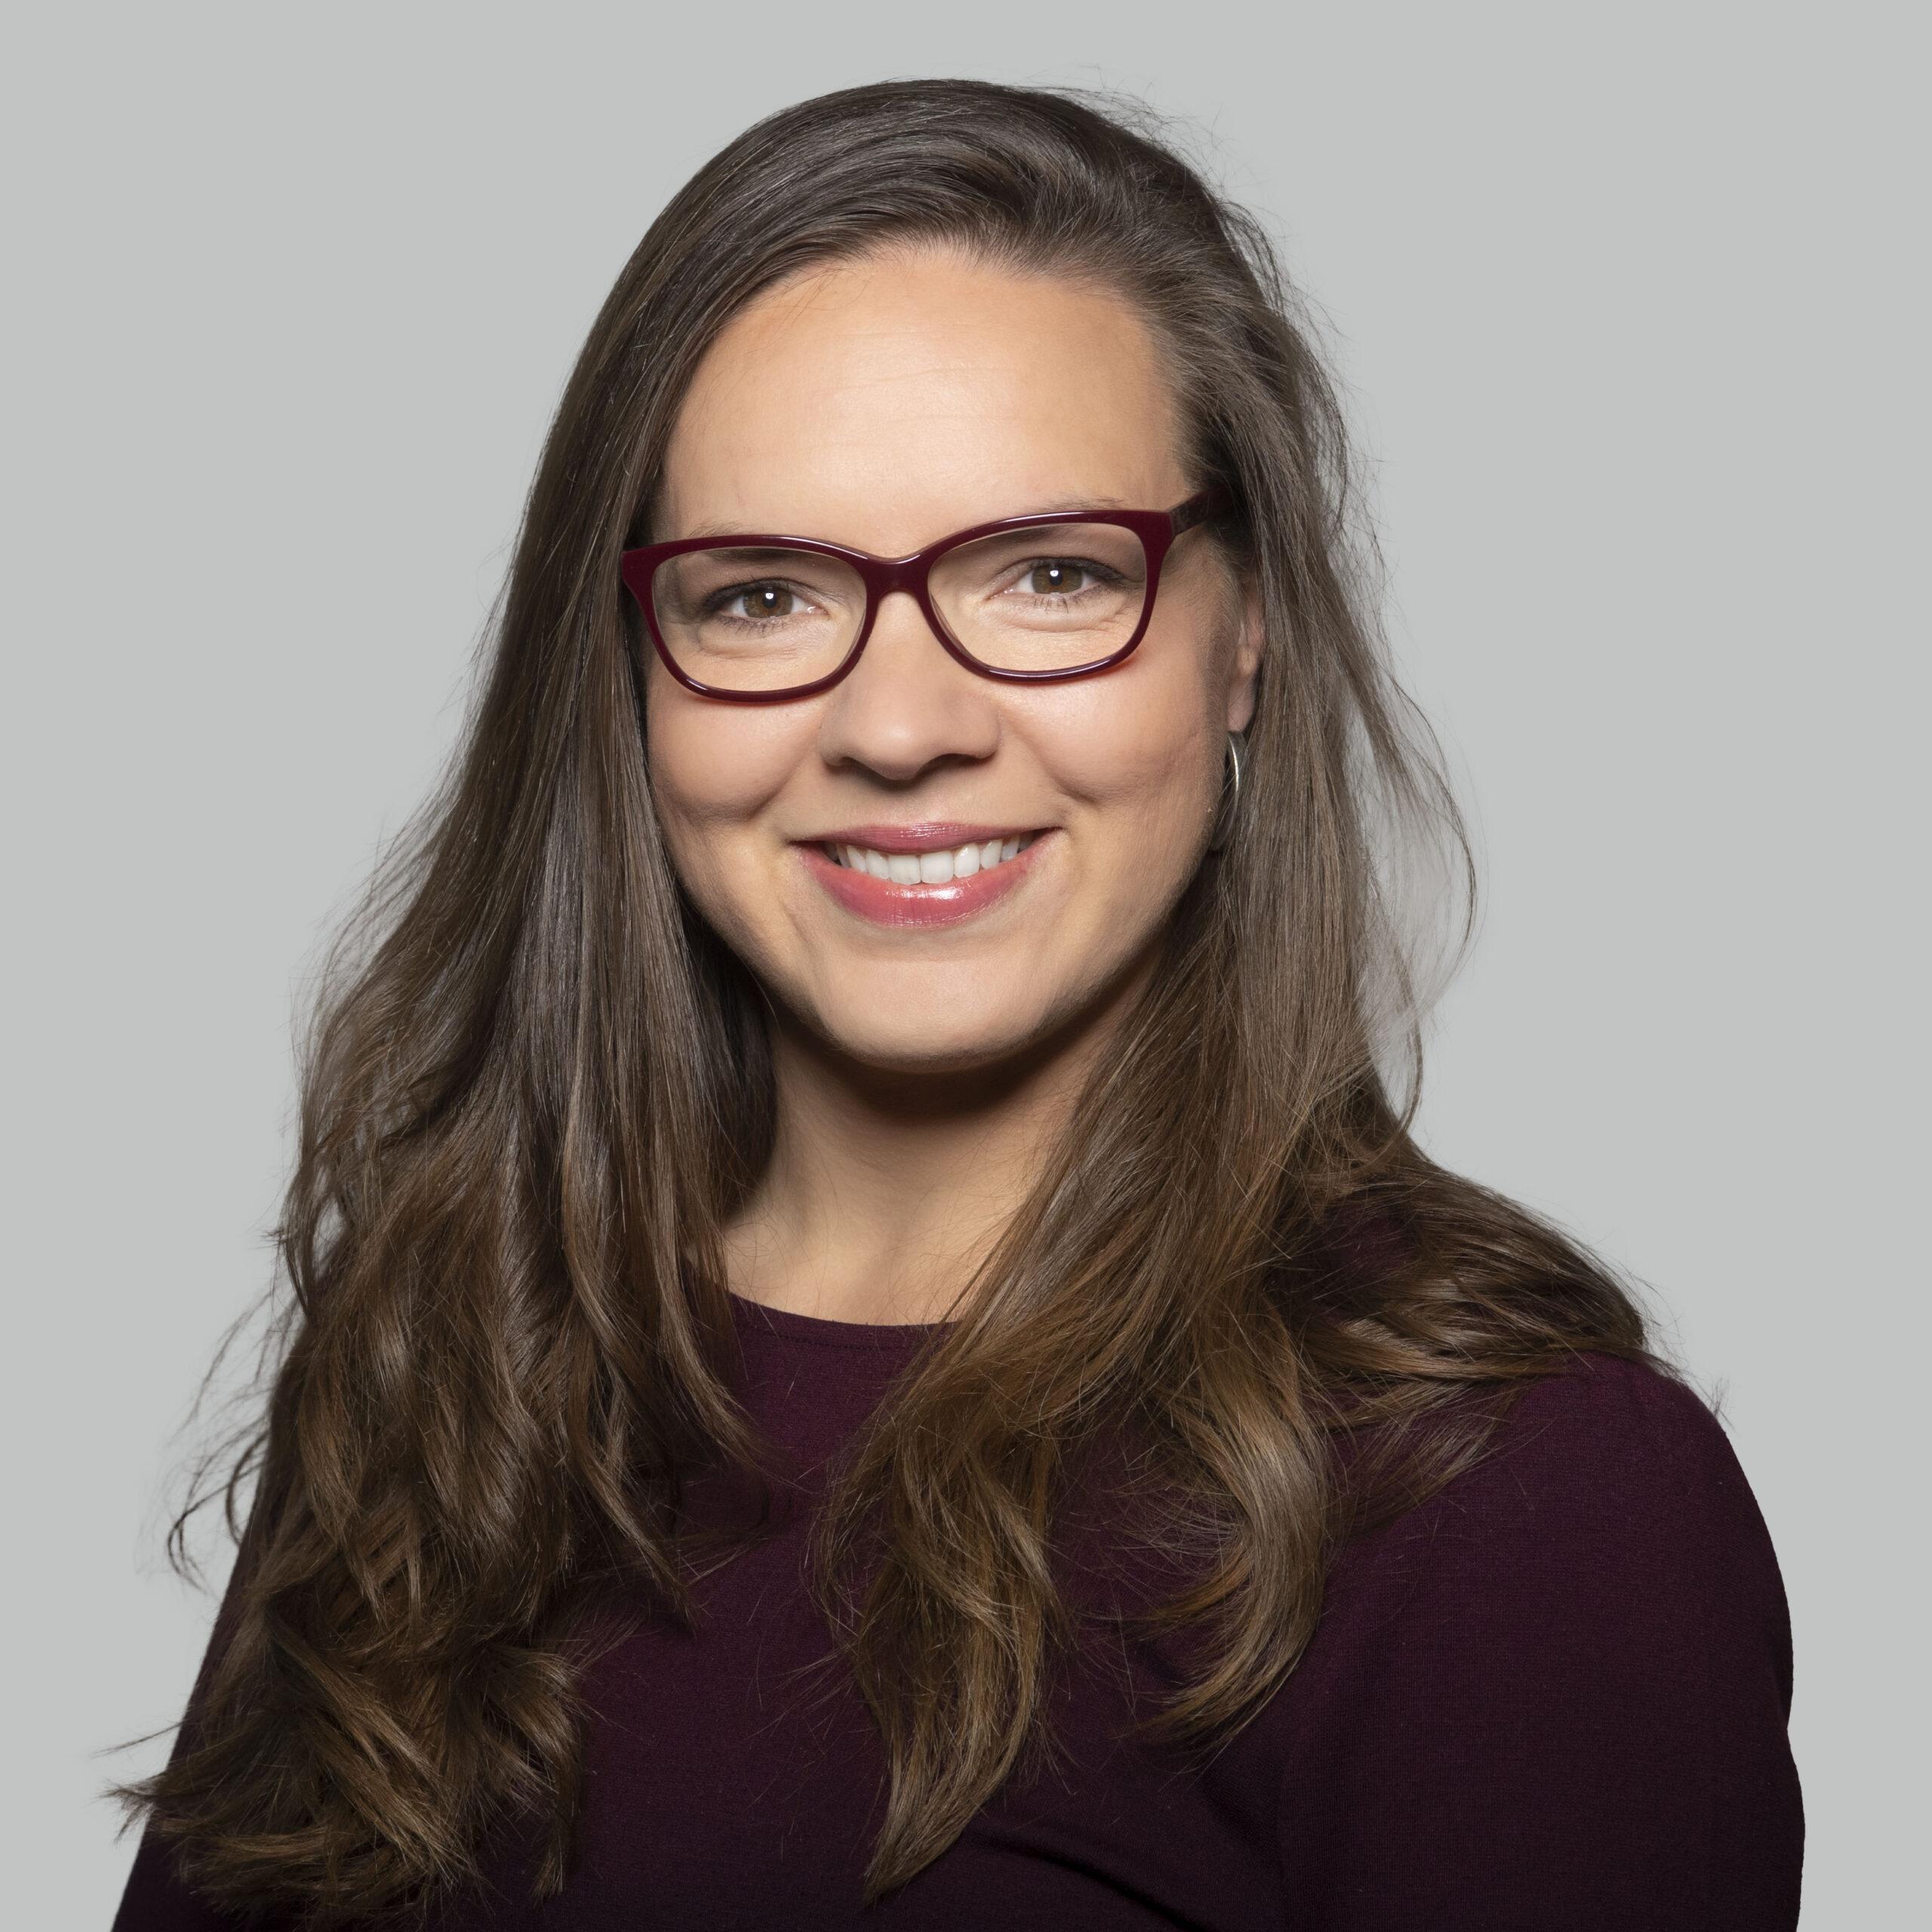 Marisca Joosten-Tamarit